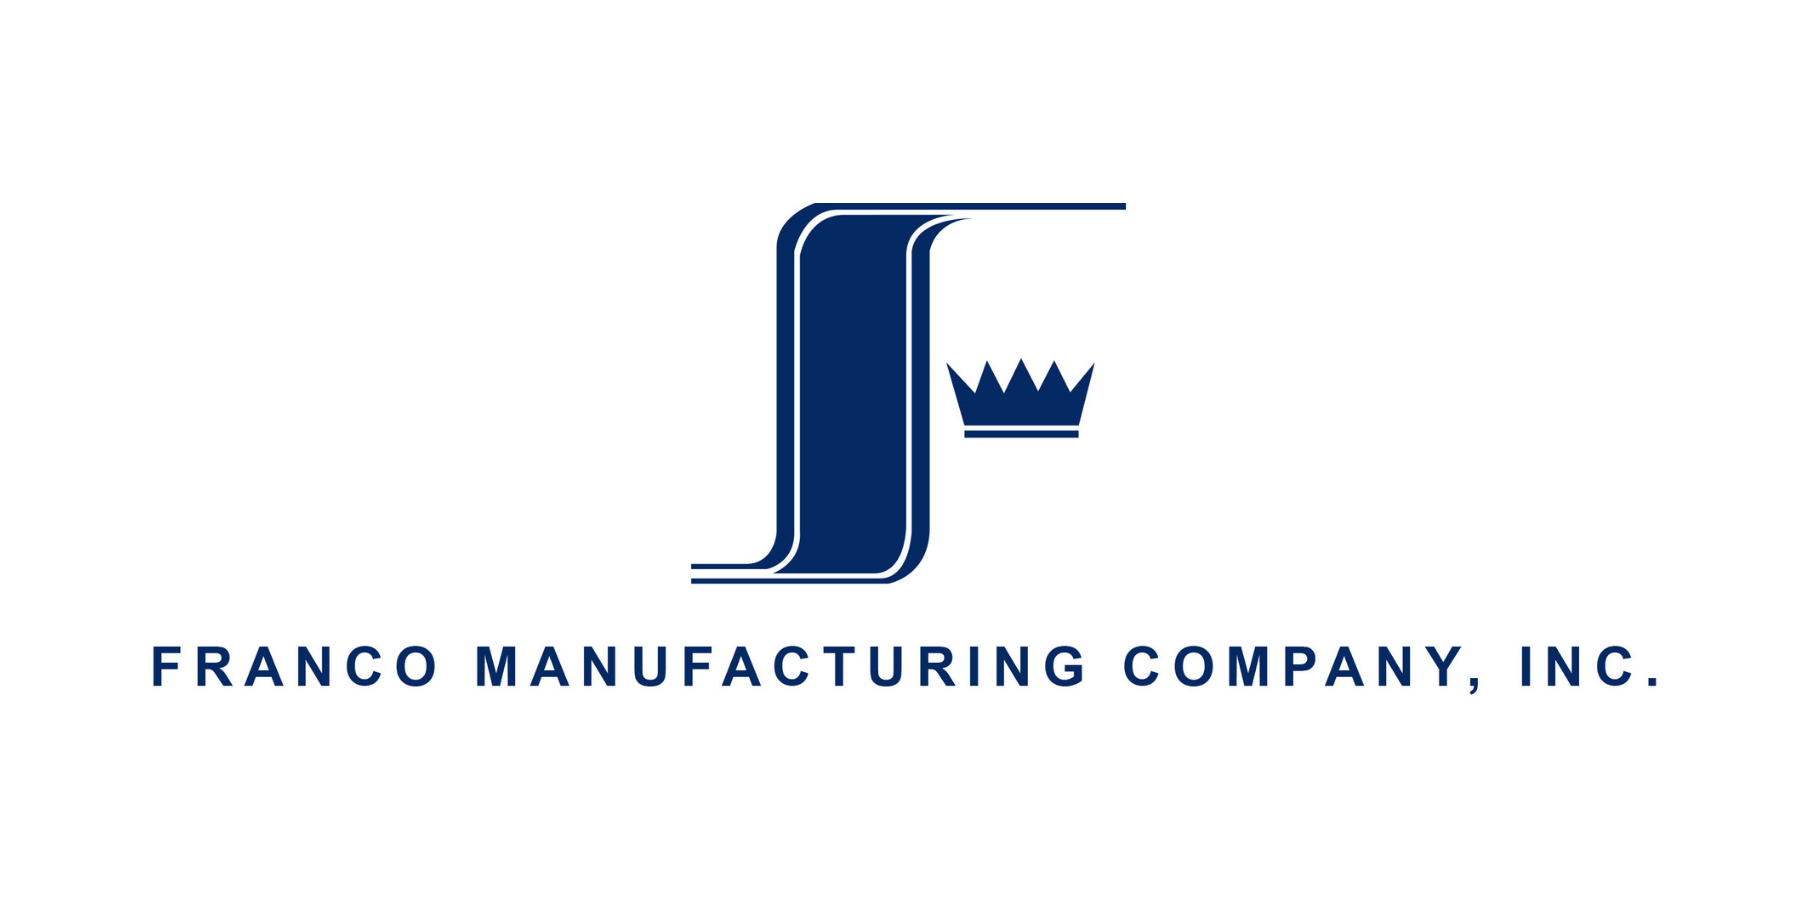 Franco Manufacturing